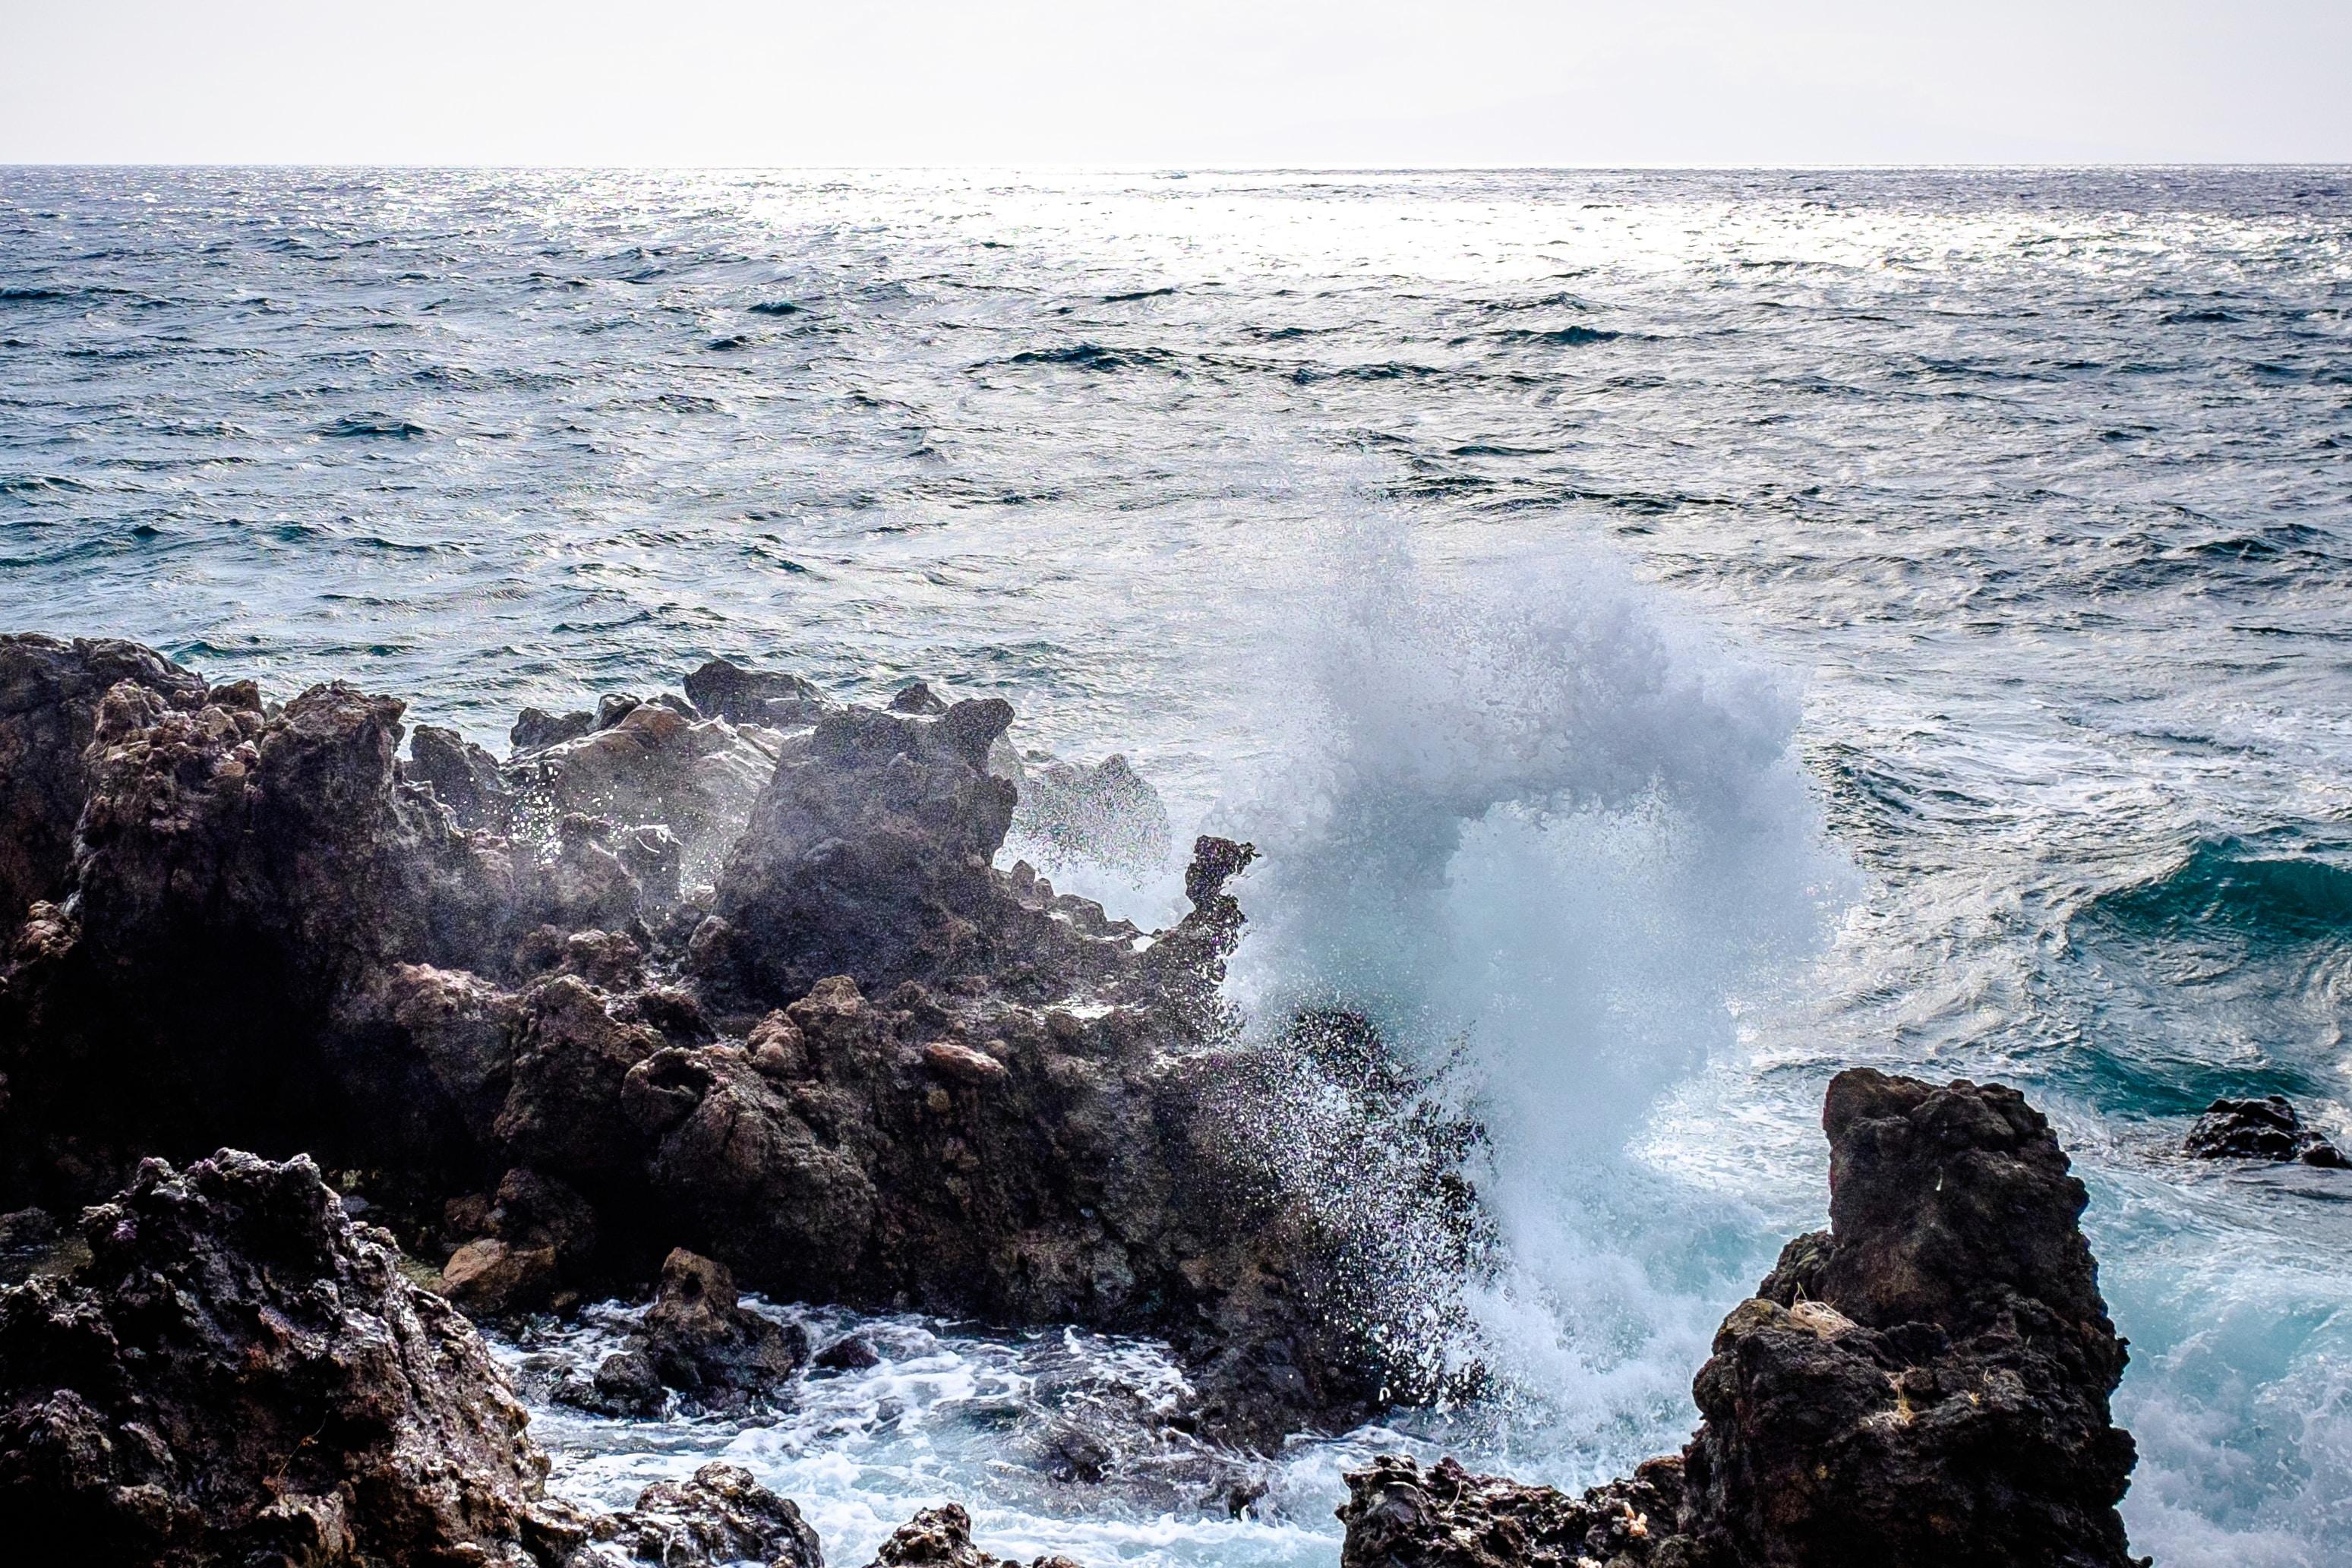 A wave breaking and splashing up onto rocks along the coast of Maui